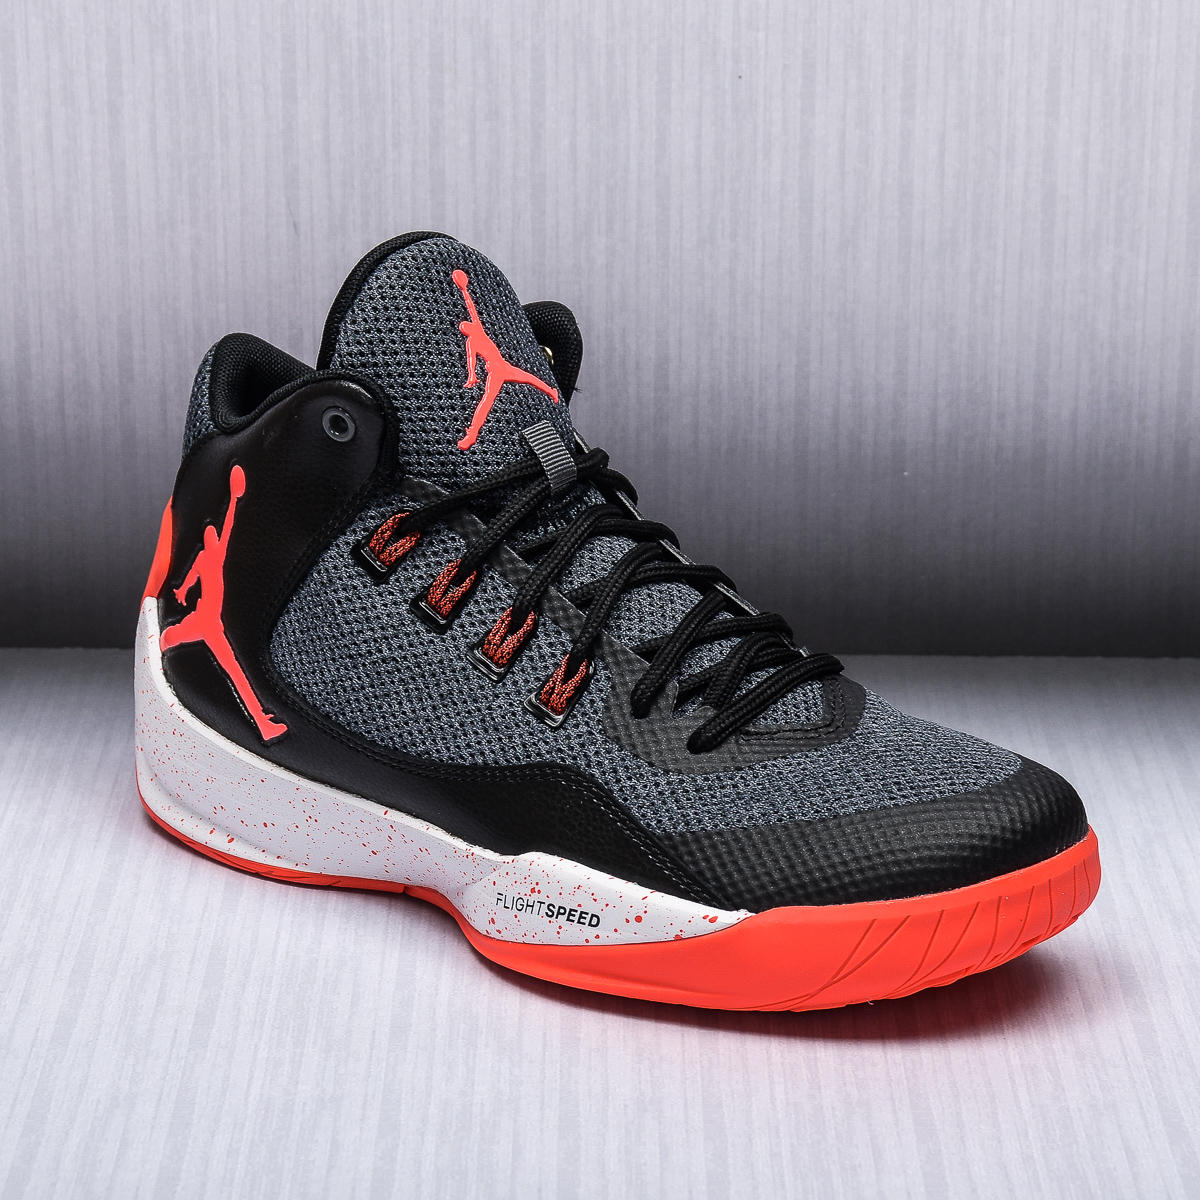 brand new cd6e0 d96cd Sha Stimuli New Jordans Toddler Red Shoes | Heart of Texas ...